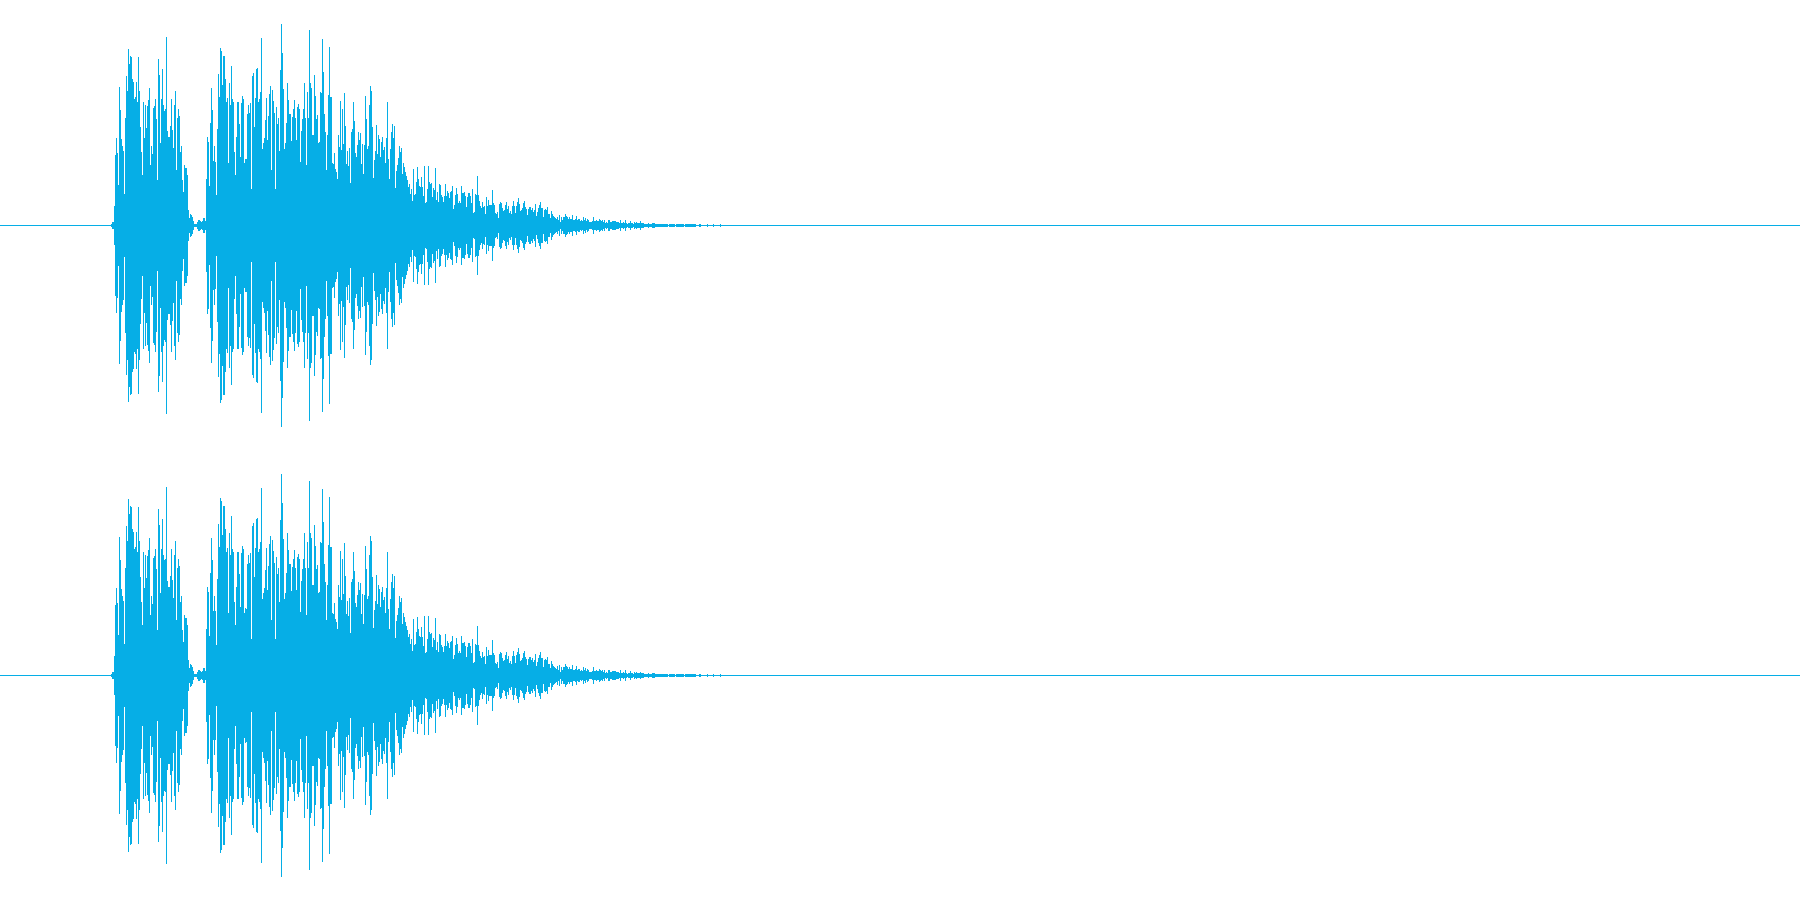 SNES 格闘05-02(ヒット)の再生済みの波形